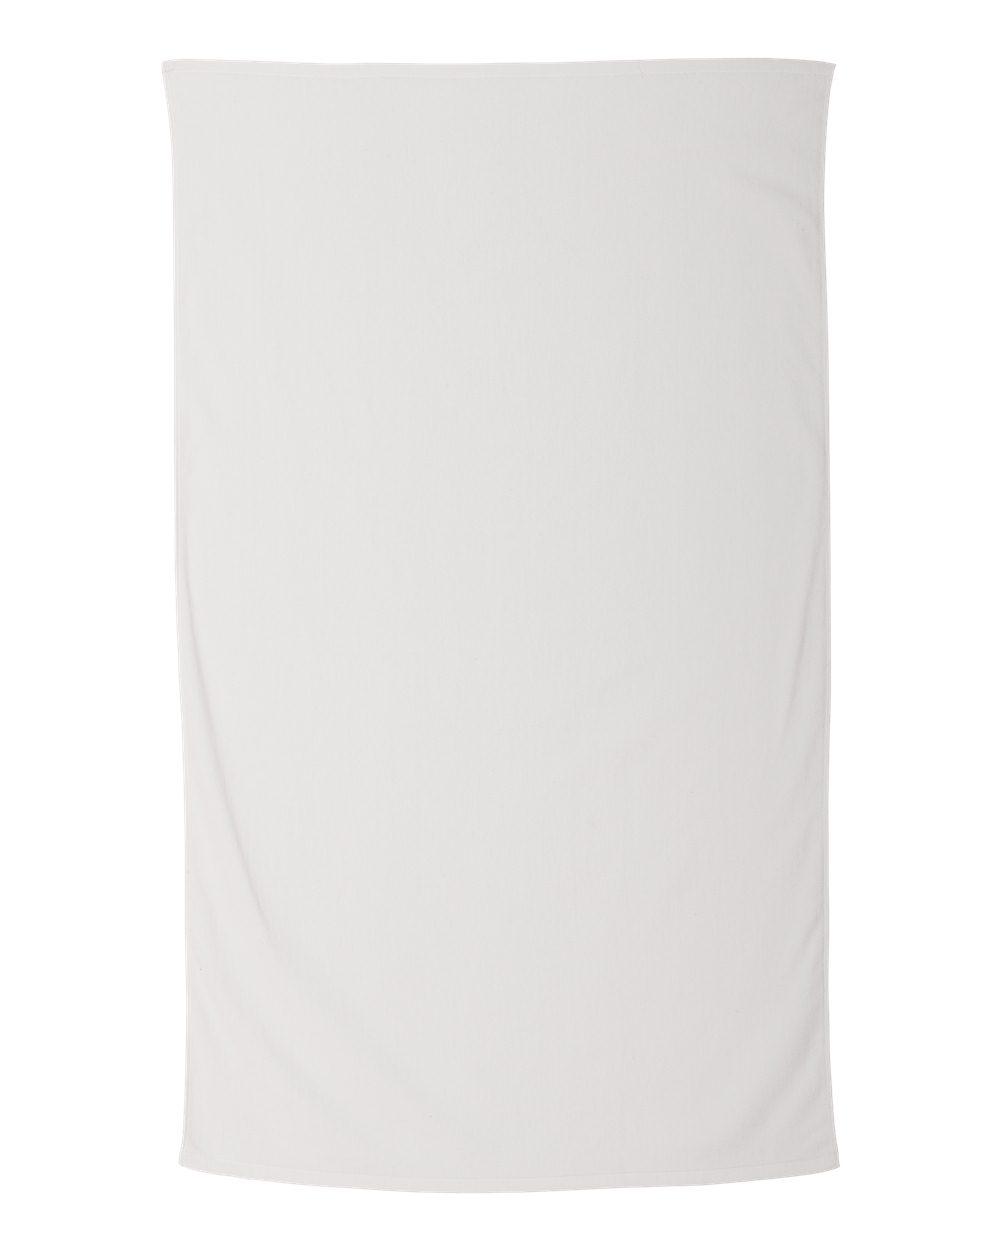 Carmel Towel Company Legacy Velour Beach Towel - C3560